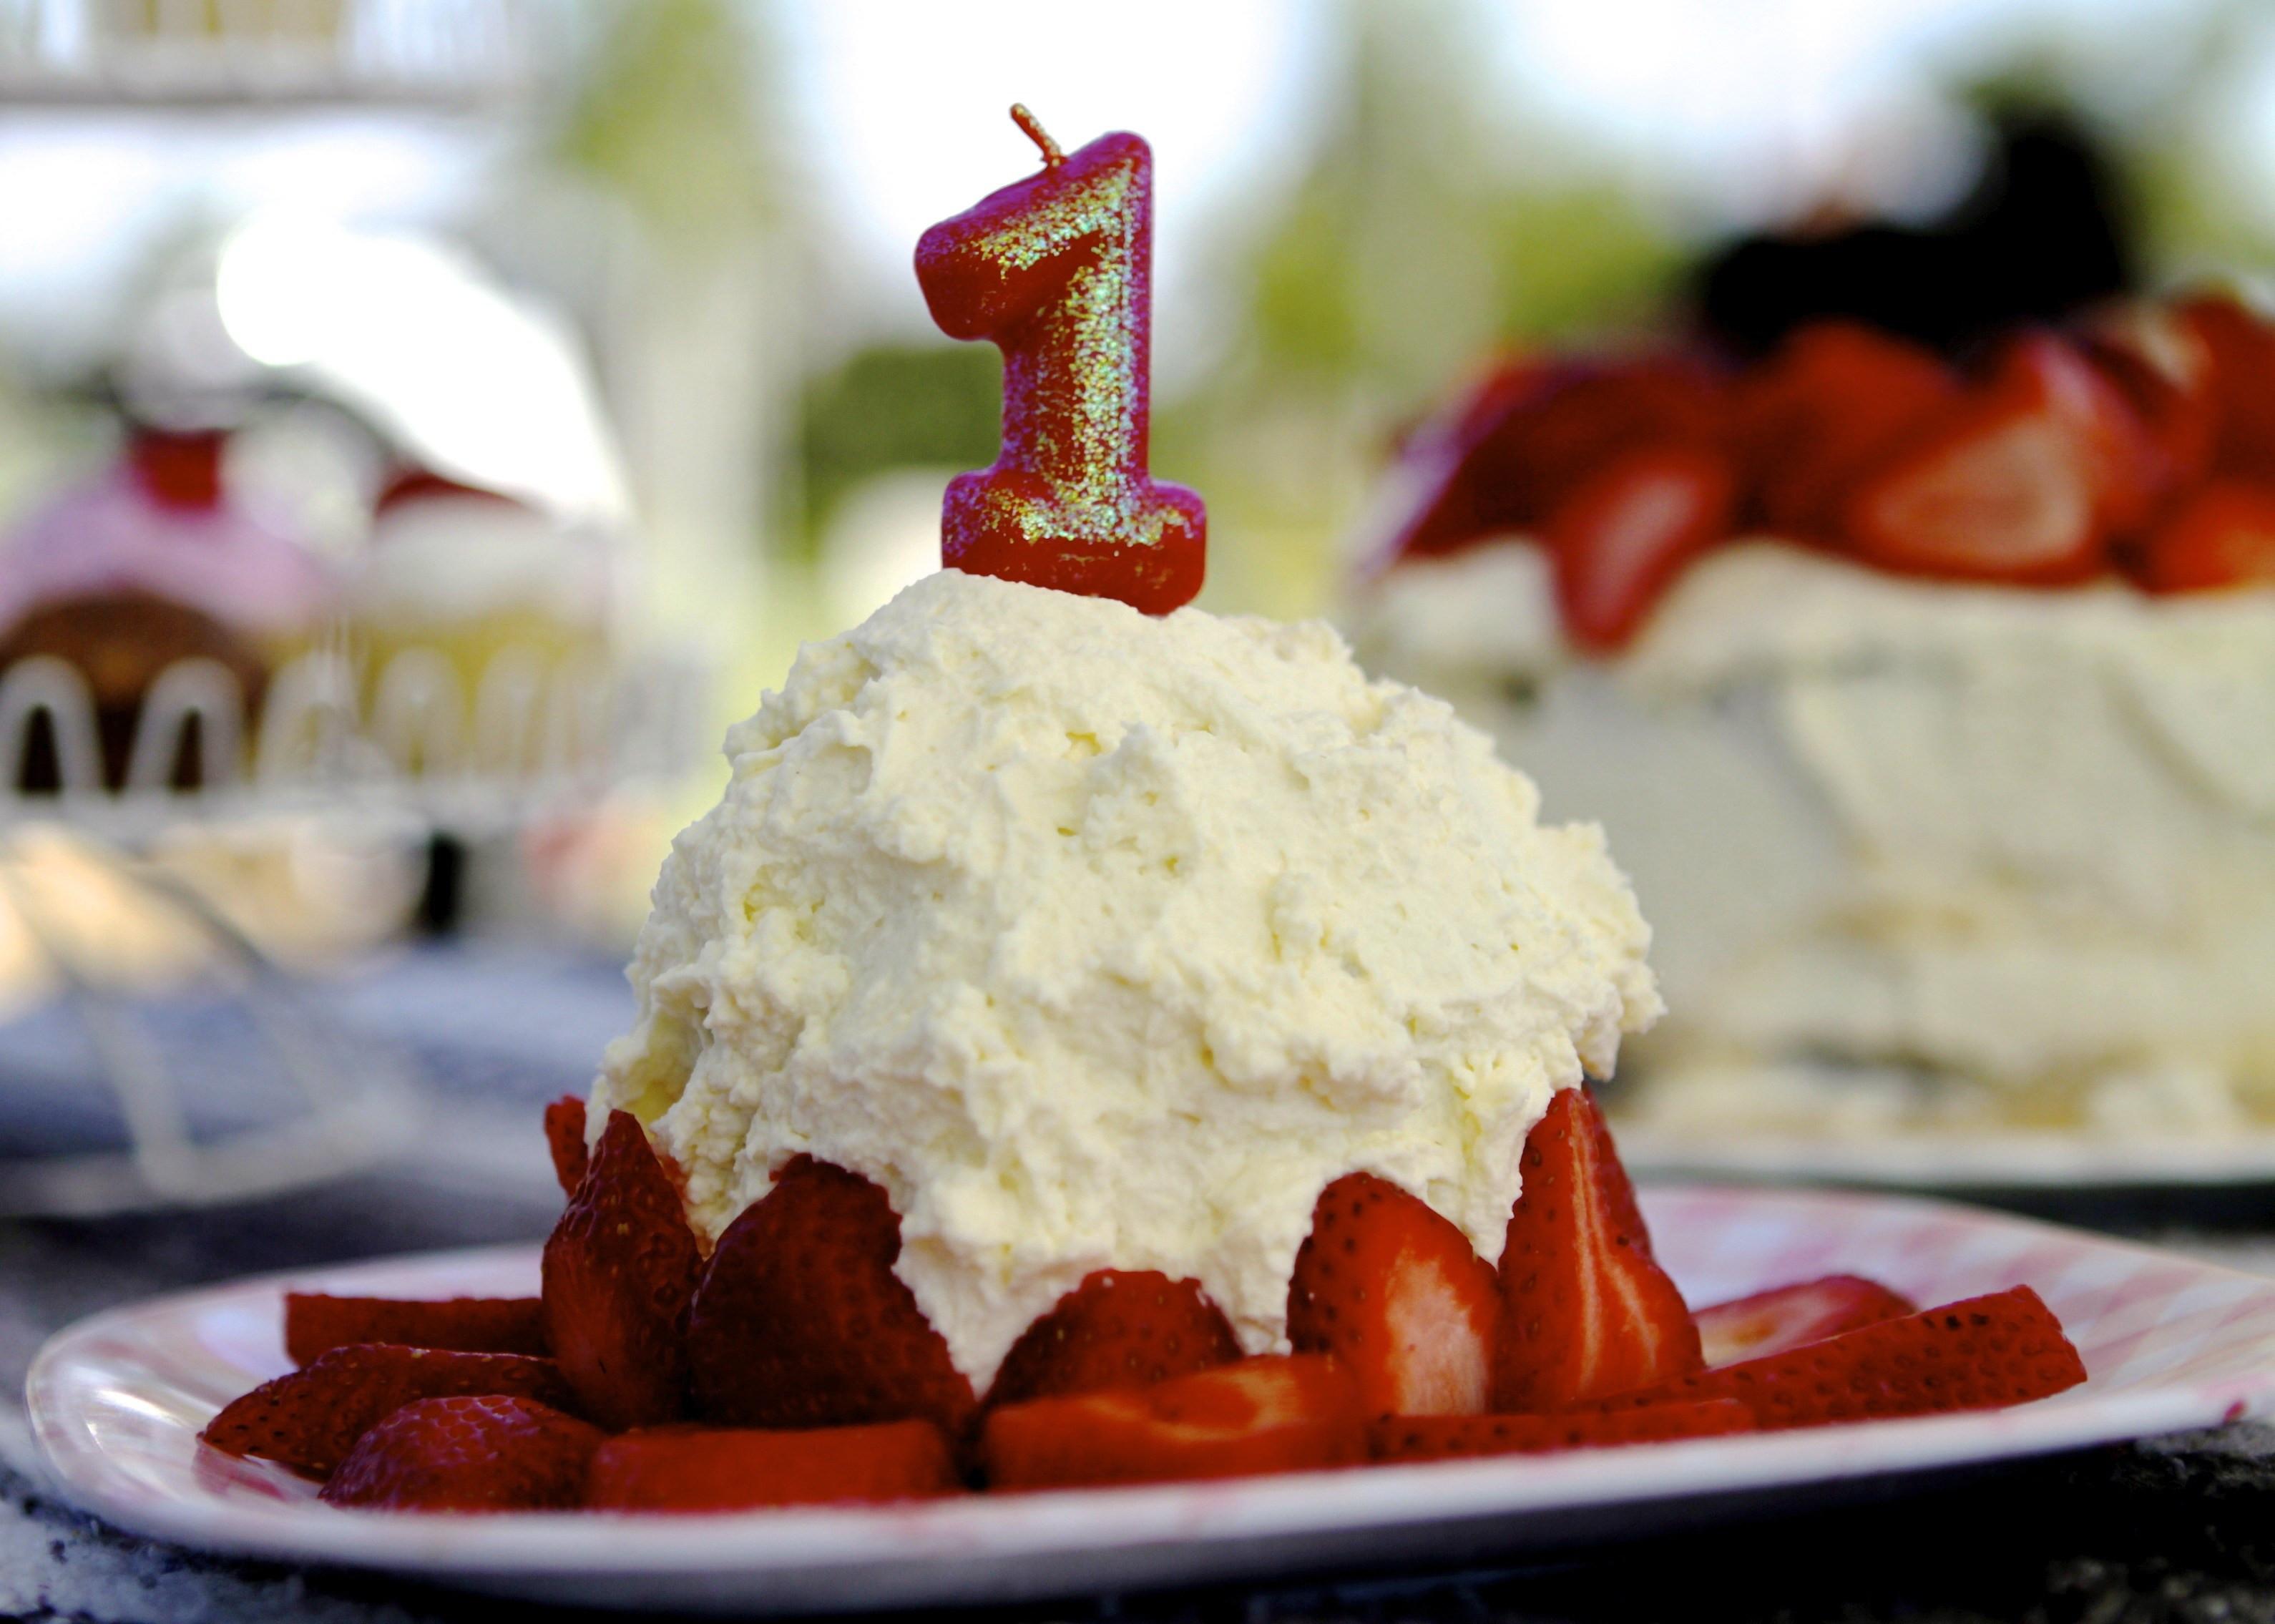 Healthy Baby First Birthday Cake  Baby Bird s Banana Smash Cake A Healthier Option for a